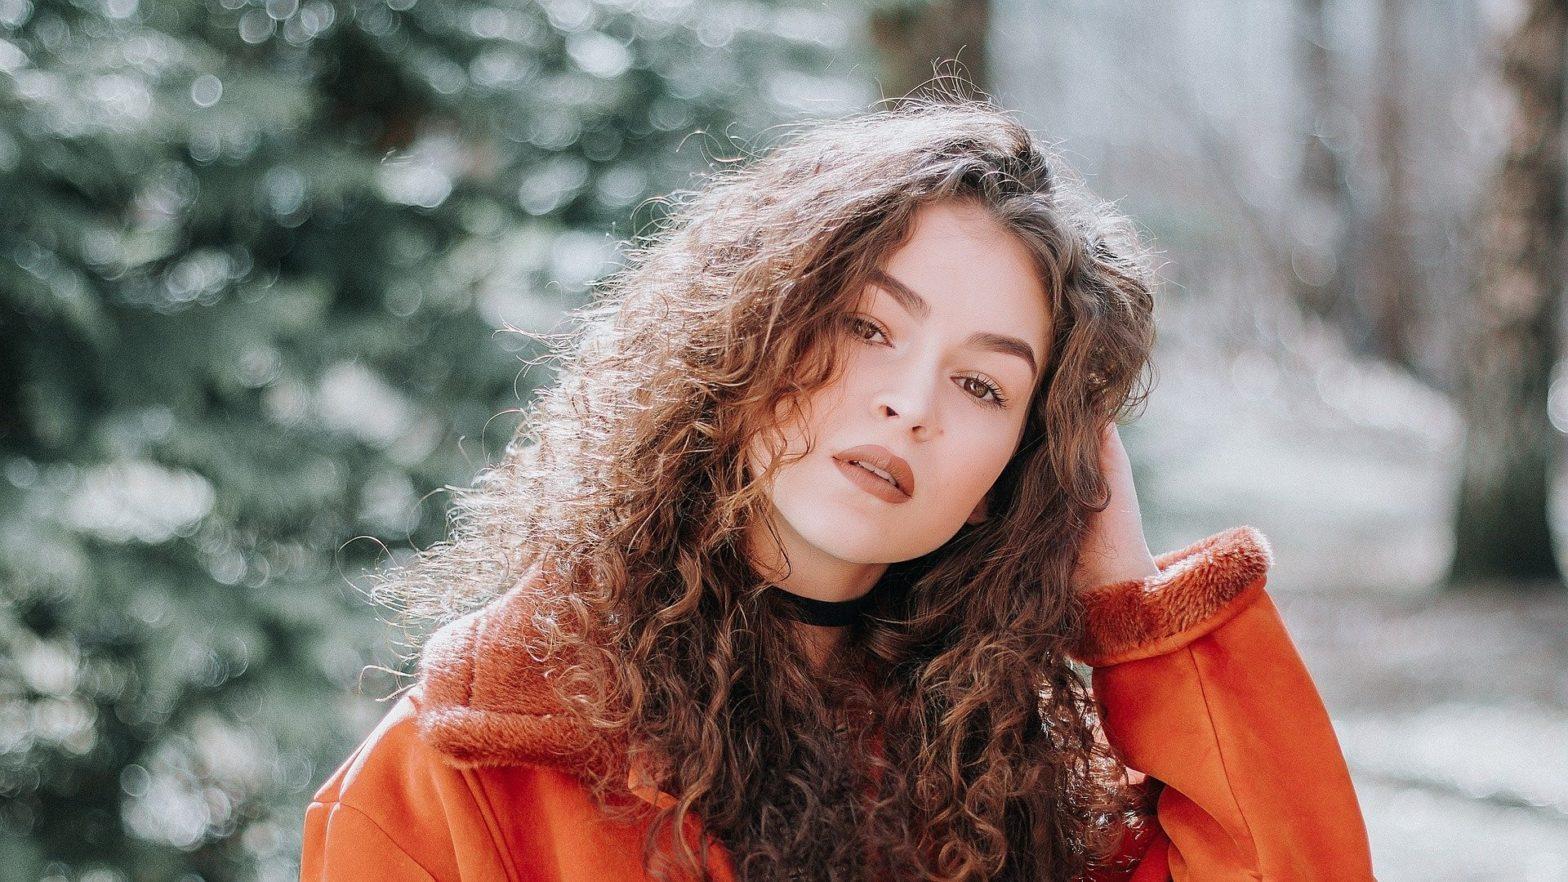 Menina de cabelos cacheados e jaqueta laranja.